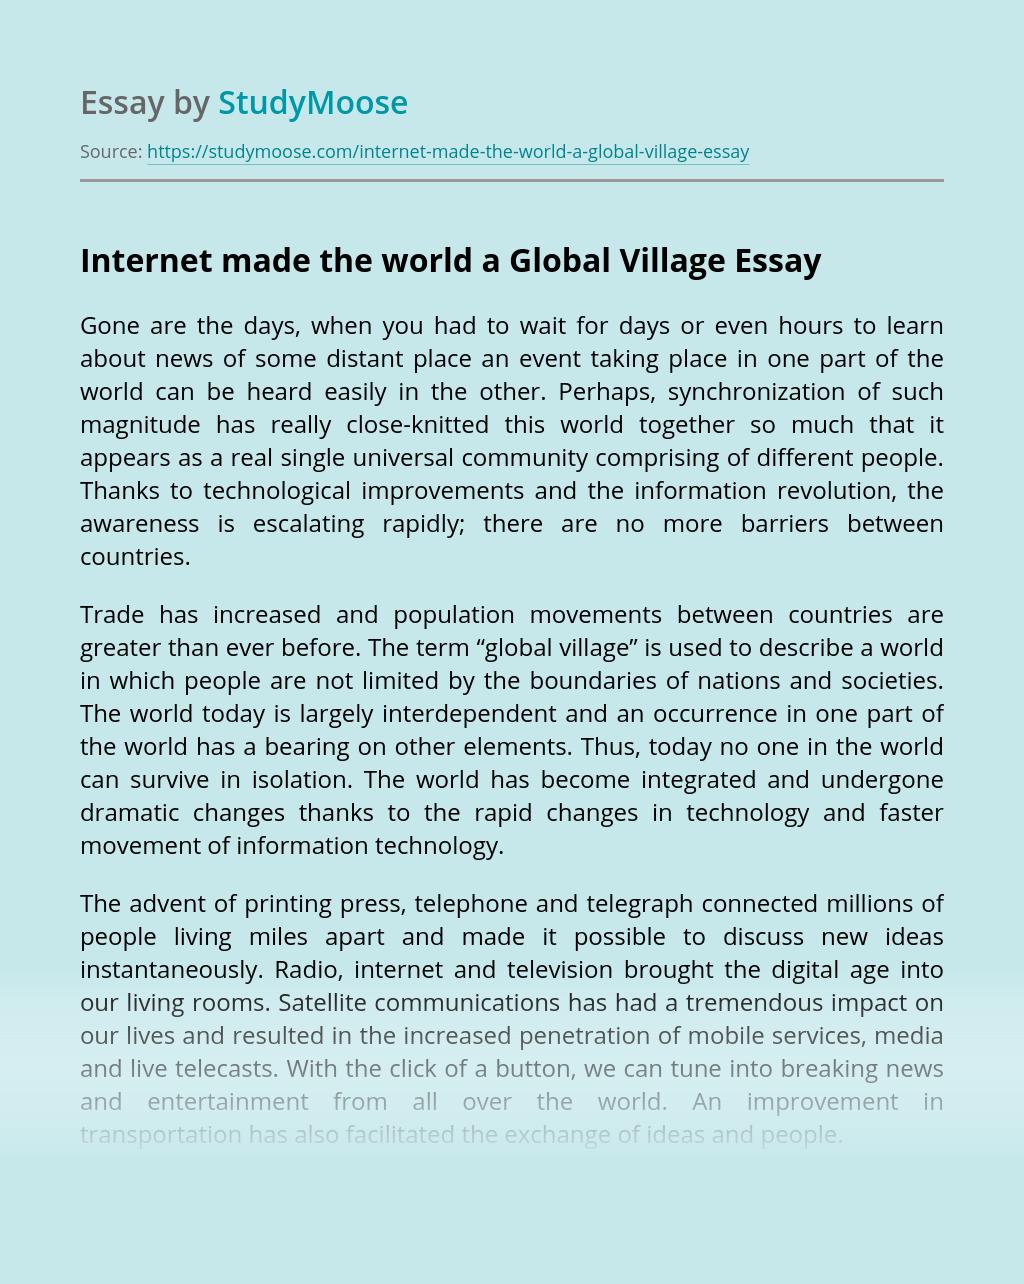 Internet made the world a Global Village